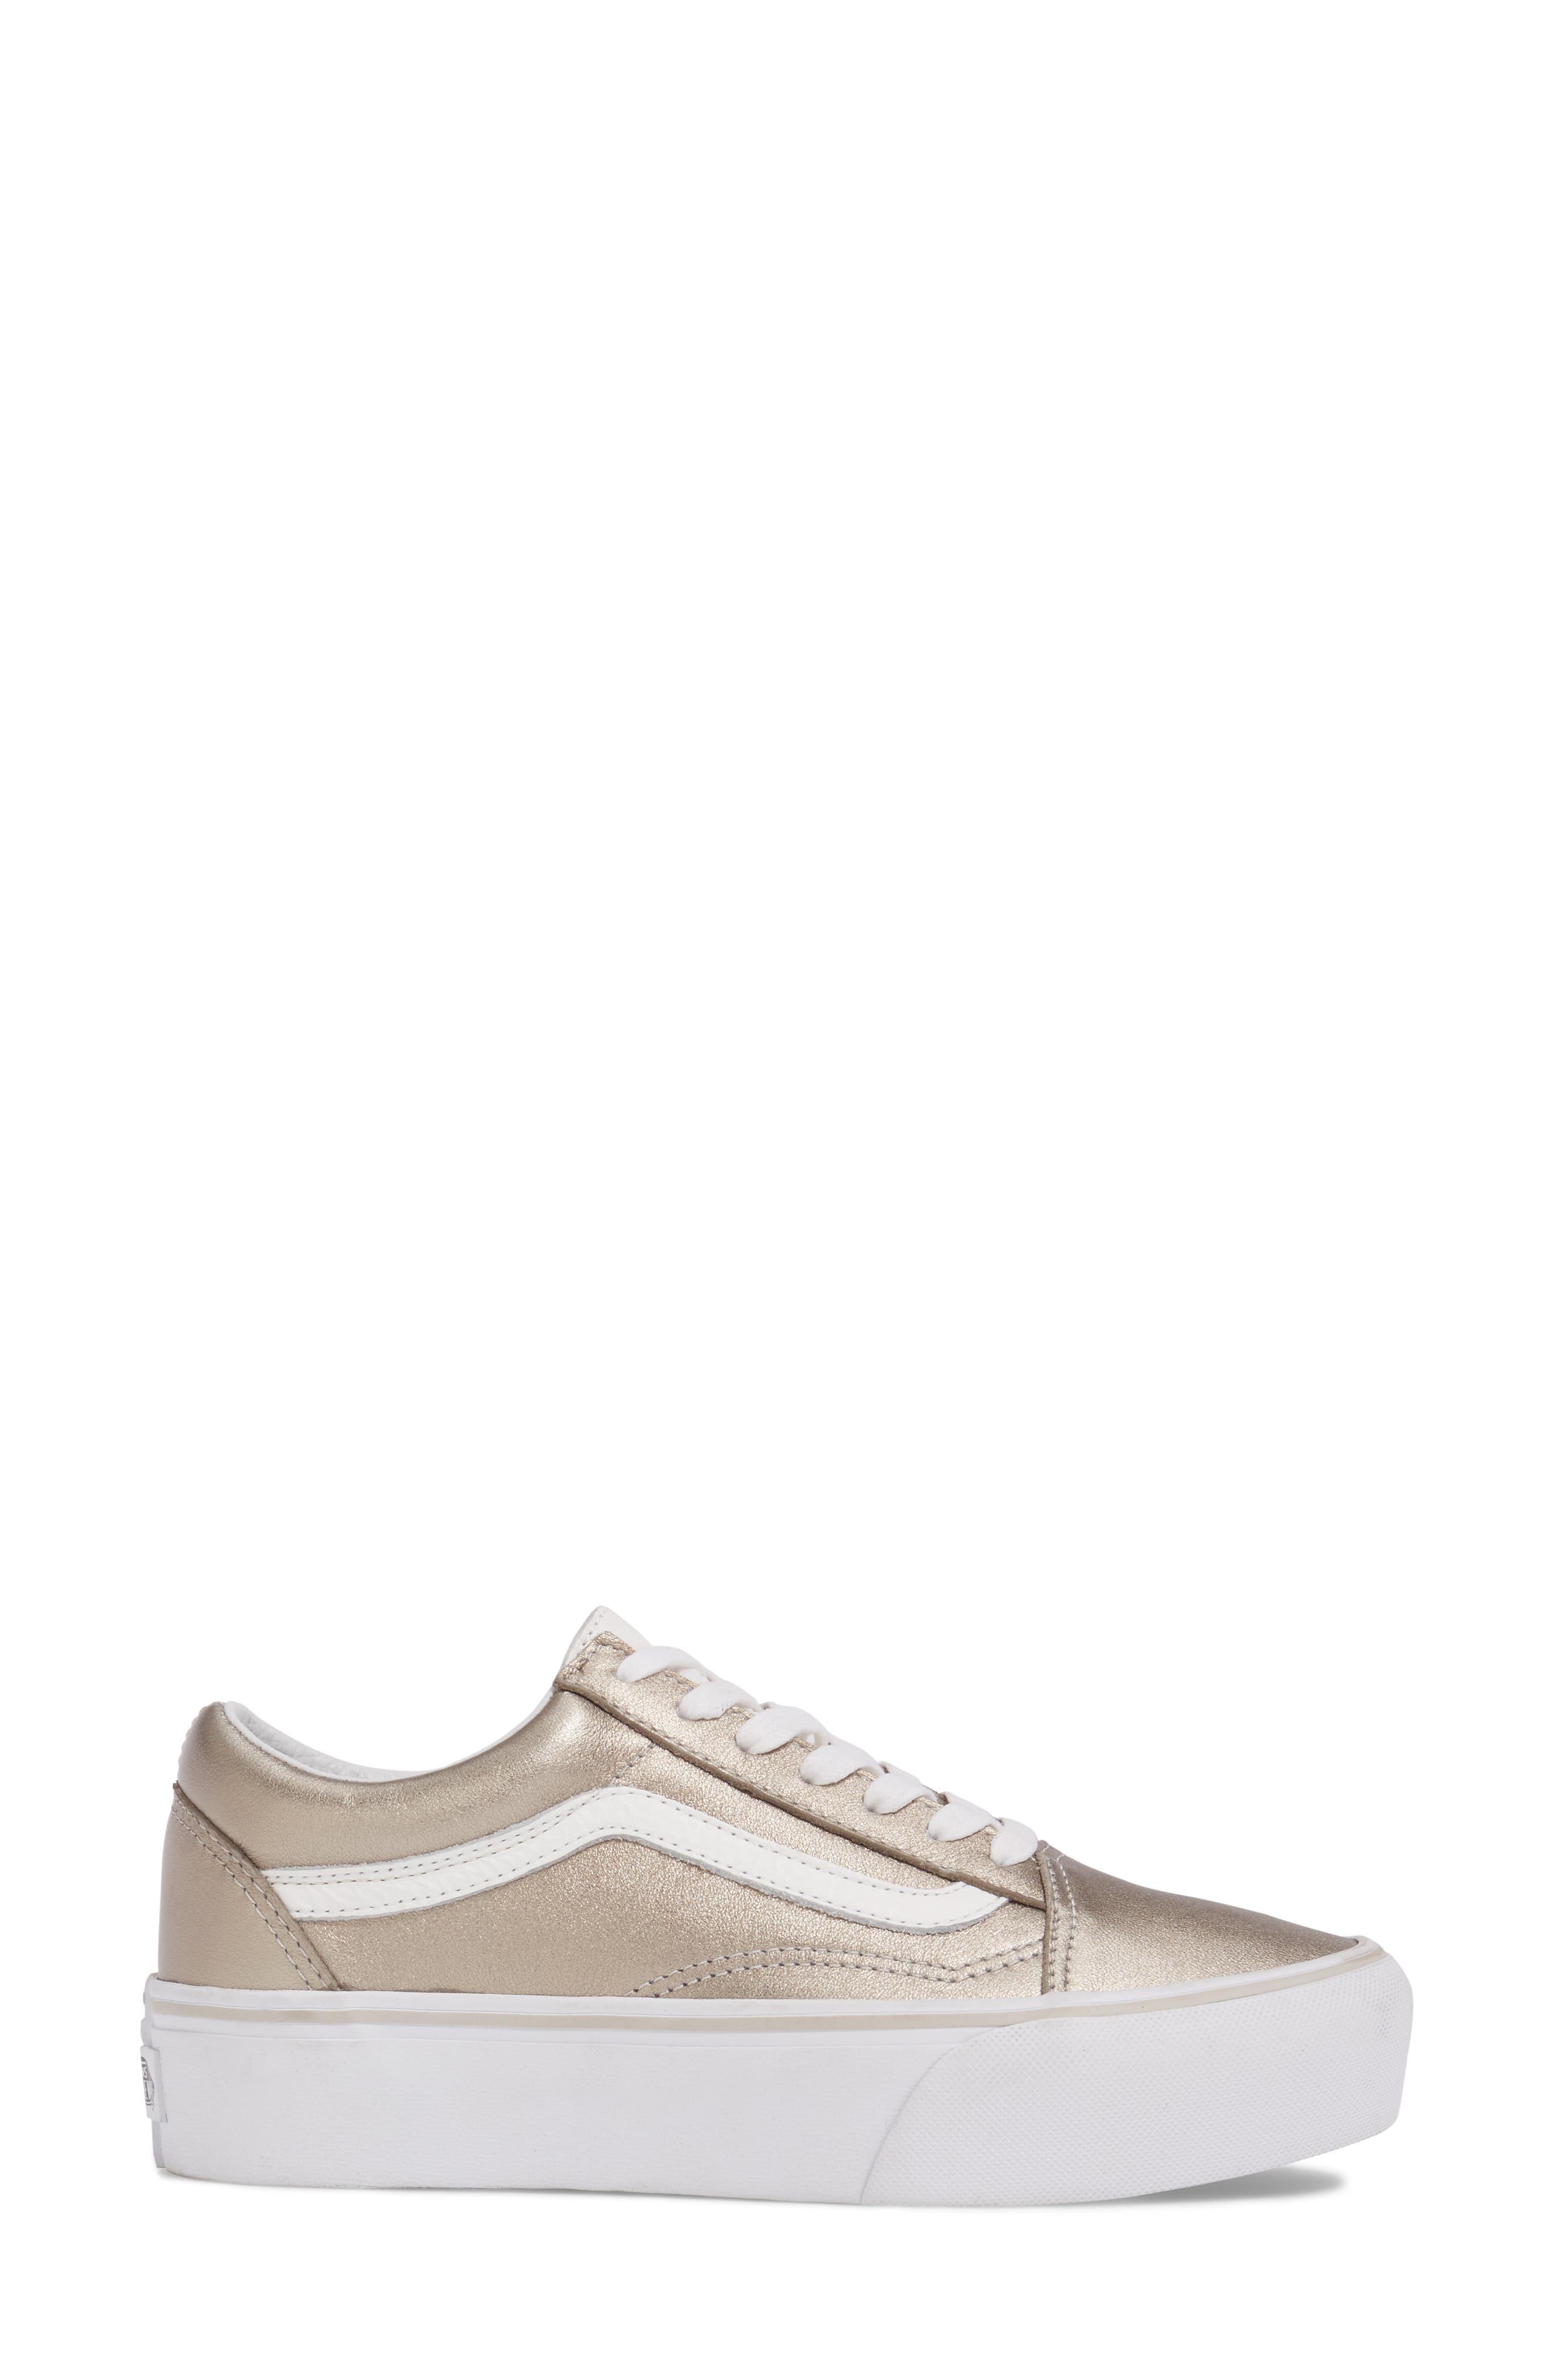 Old Skool Platform Sneaker,                             Alternate thumbnail 15, color,